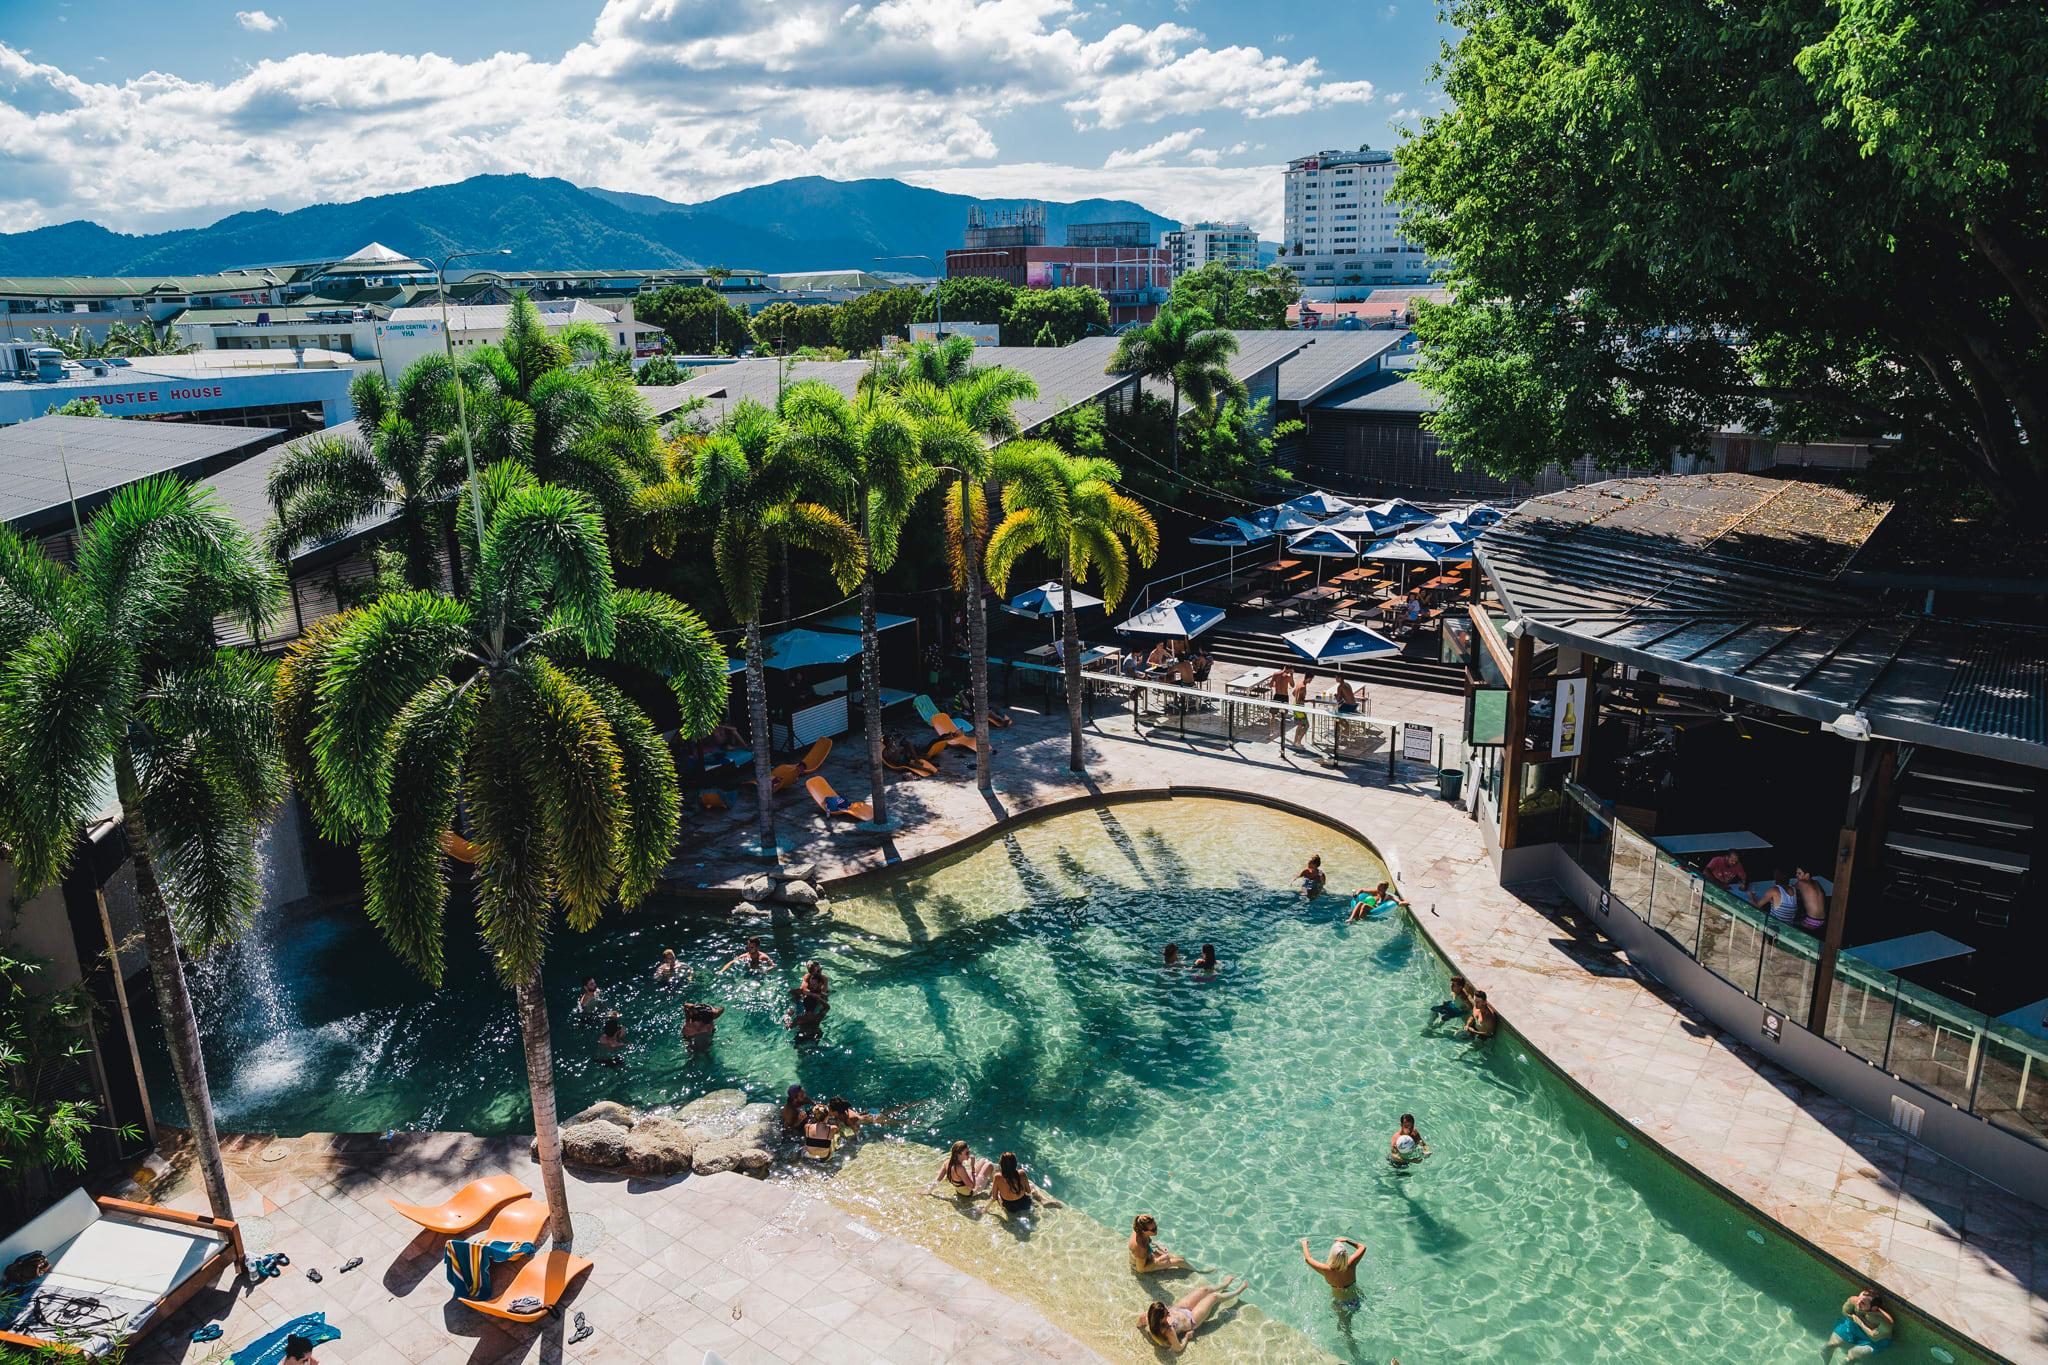 Gilligan's Backpacker Hotel & Resort Cairns